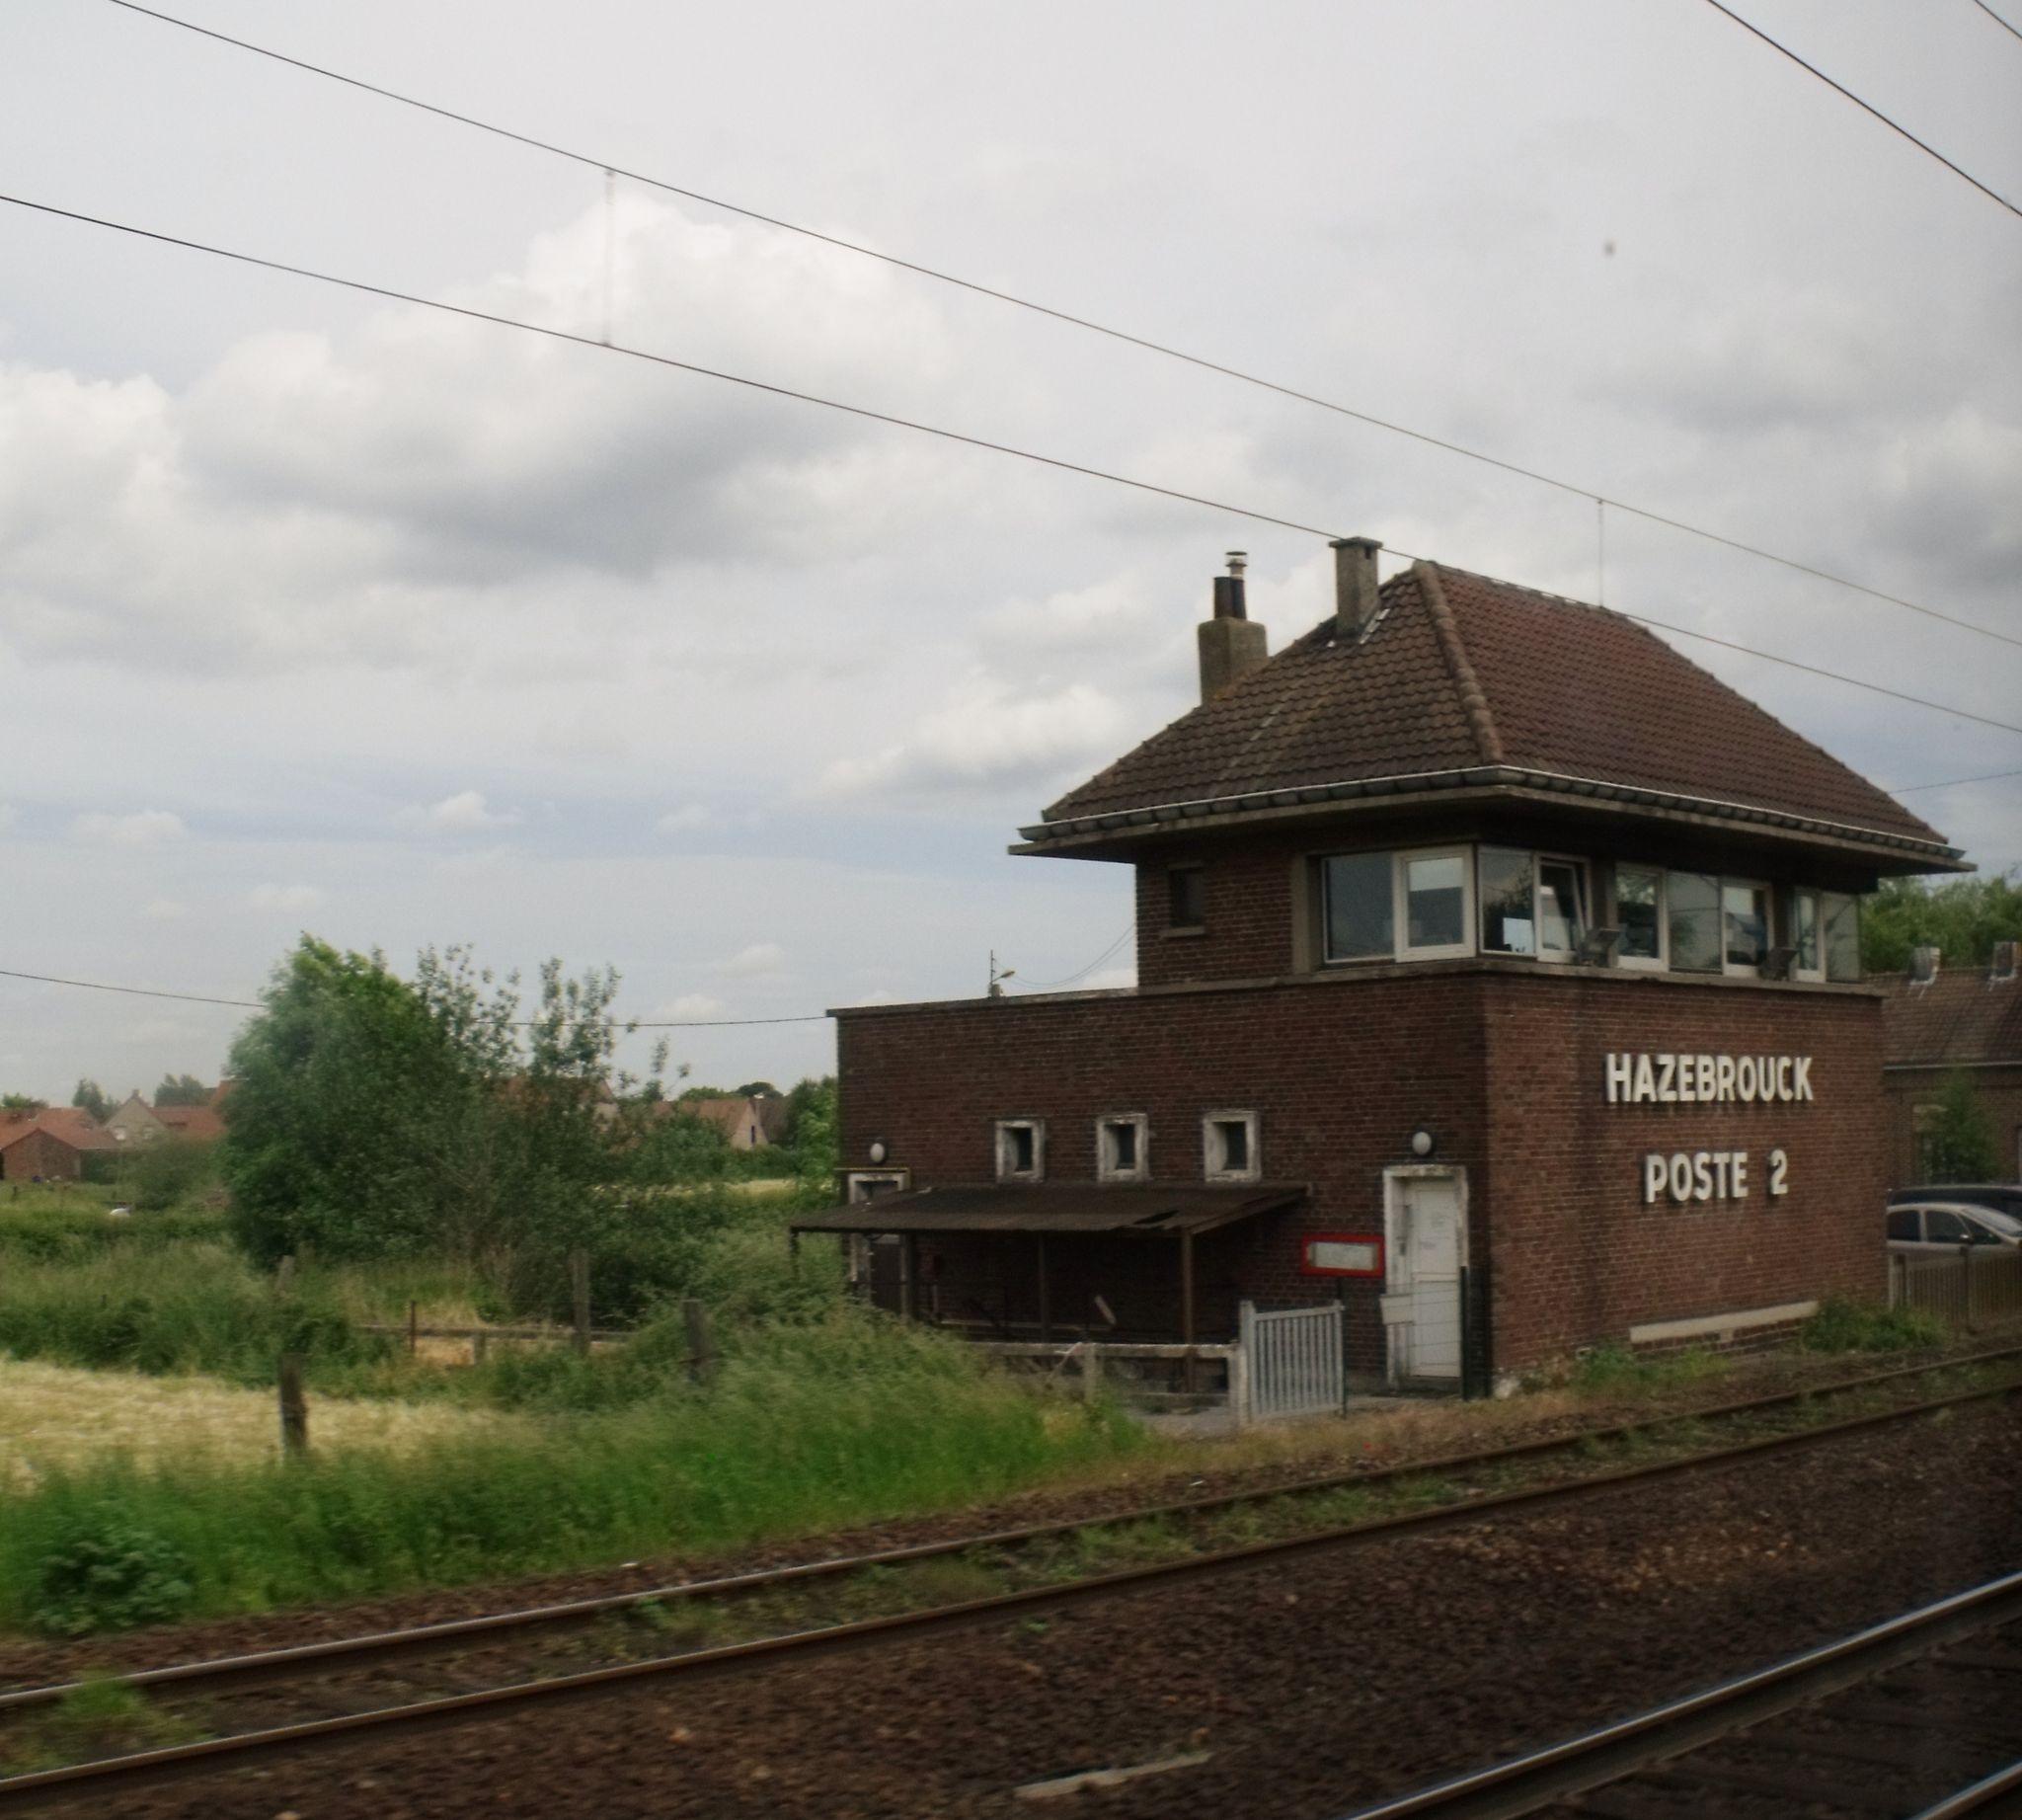 Hazebrouck (Nord) Poste 2